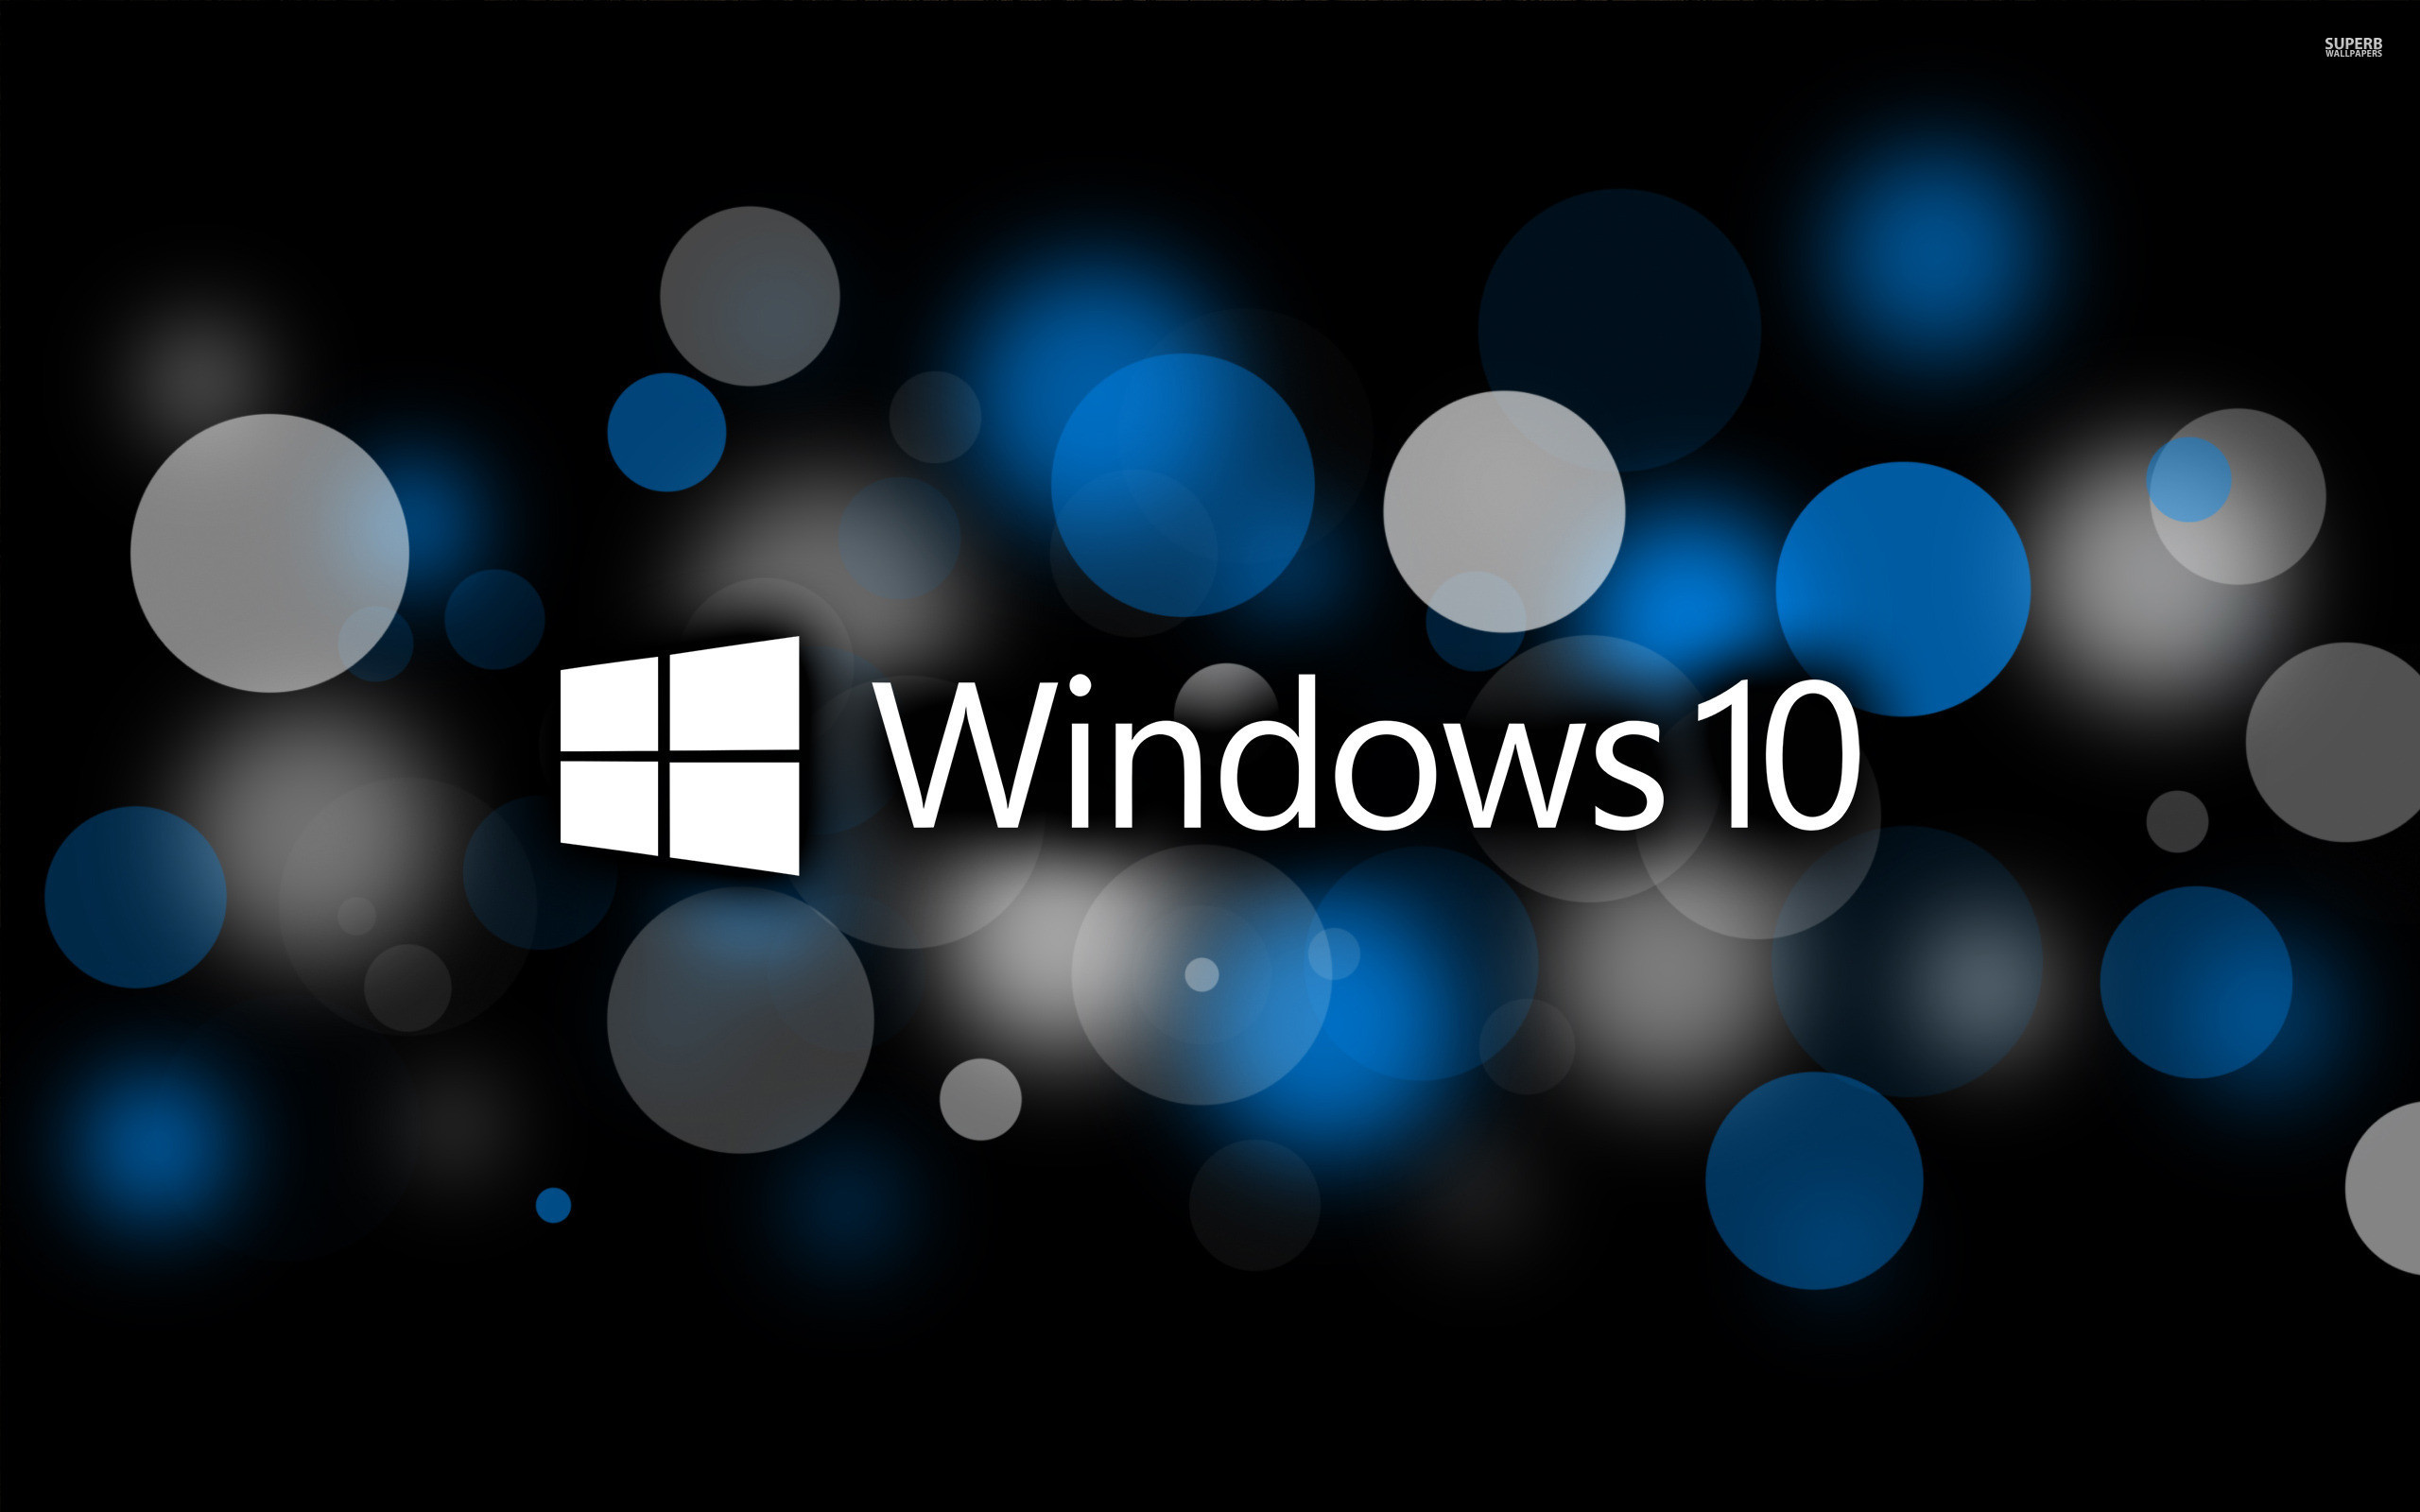 2560x1600 Windows 10 Wallpaper HD 1080p #5337 Wallpaper | Download HD Wallpaper